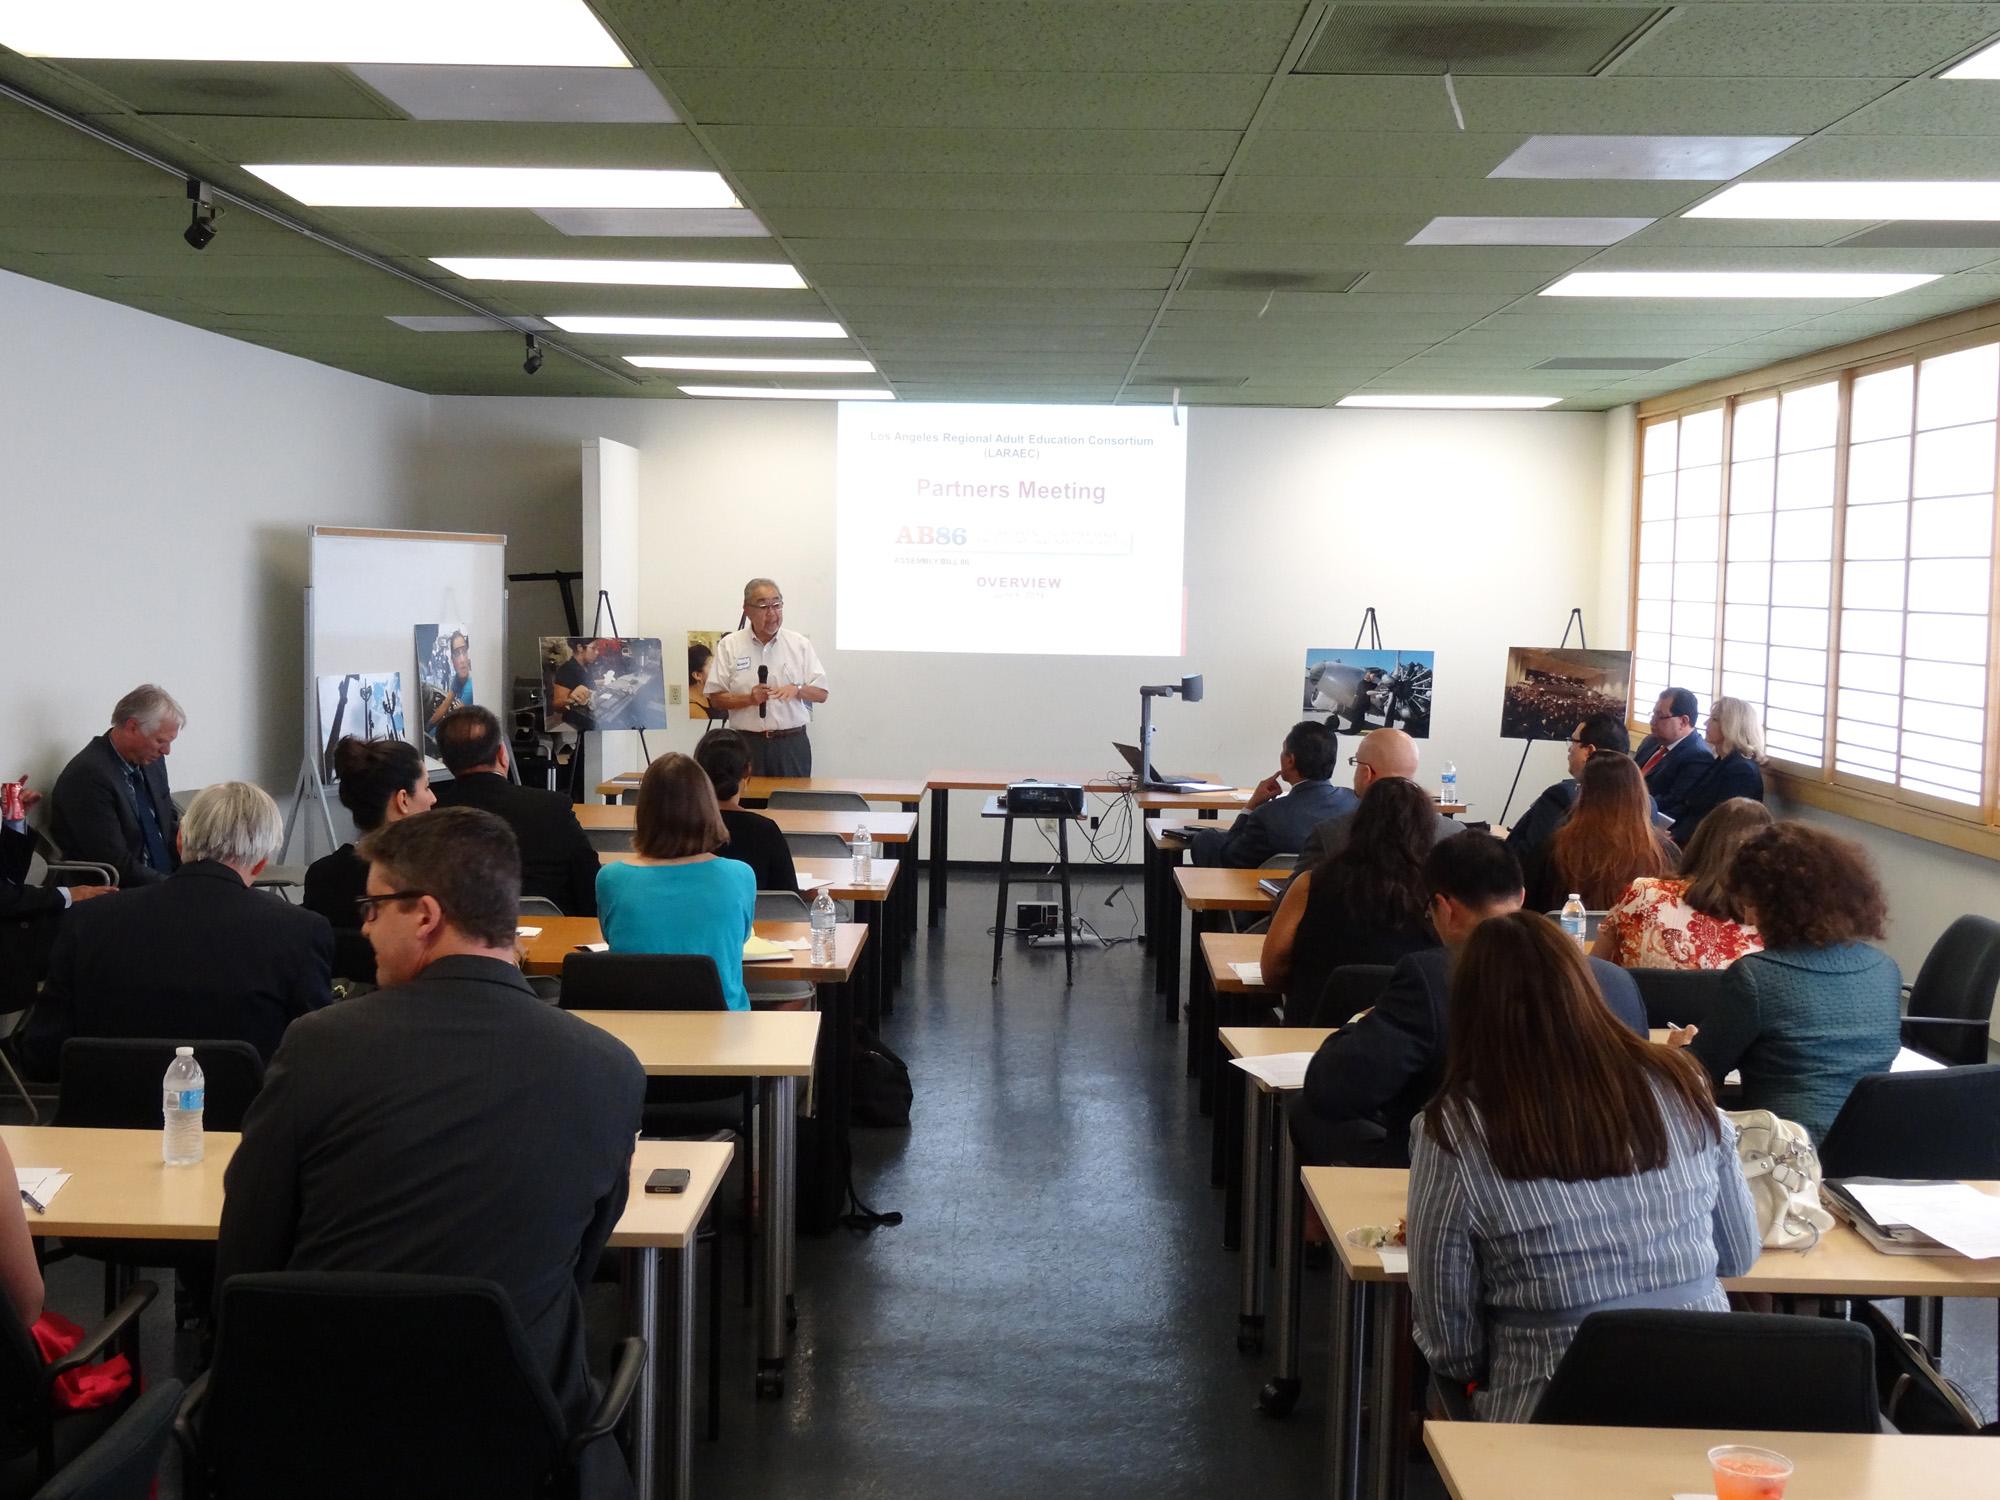 LARAEC-Partners-Meeting-06-06-14-06